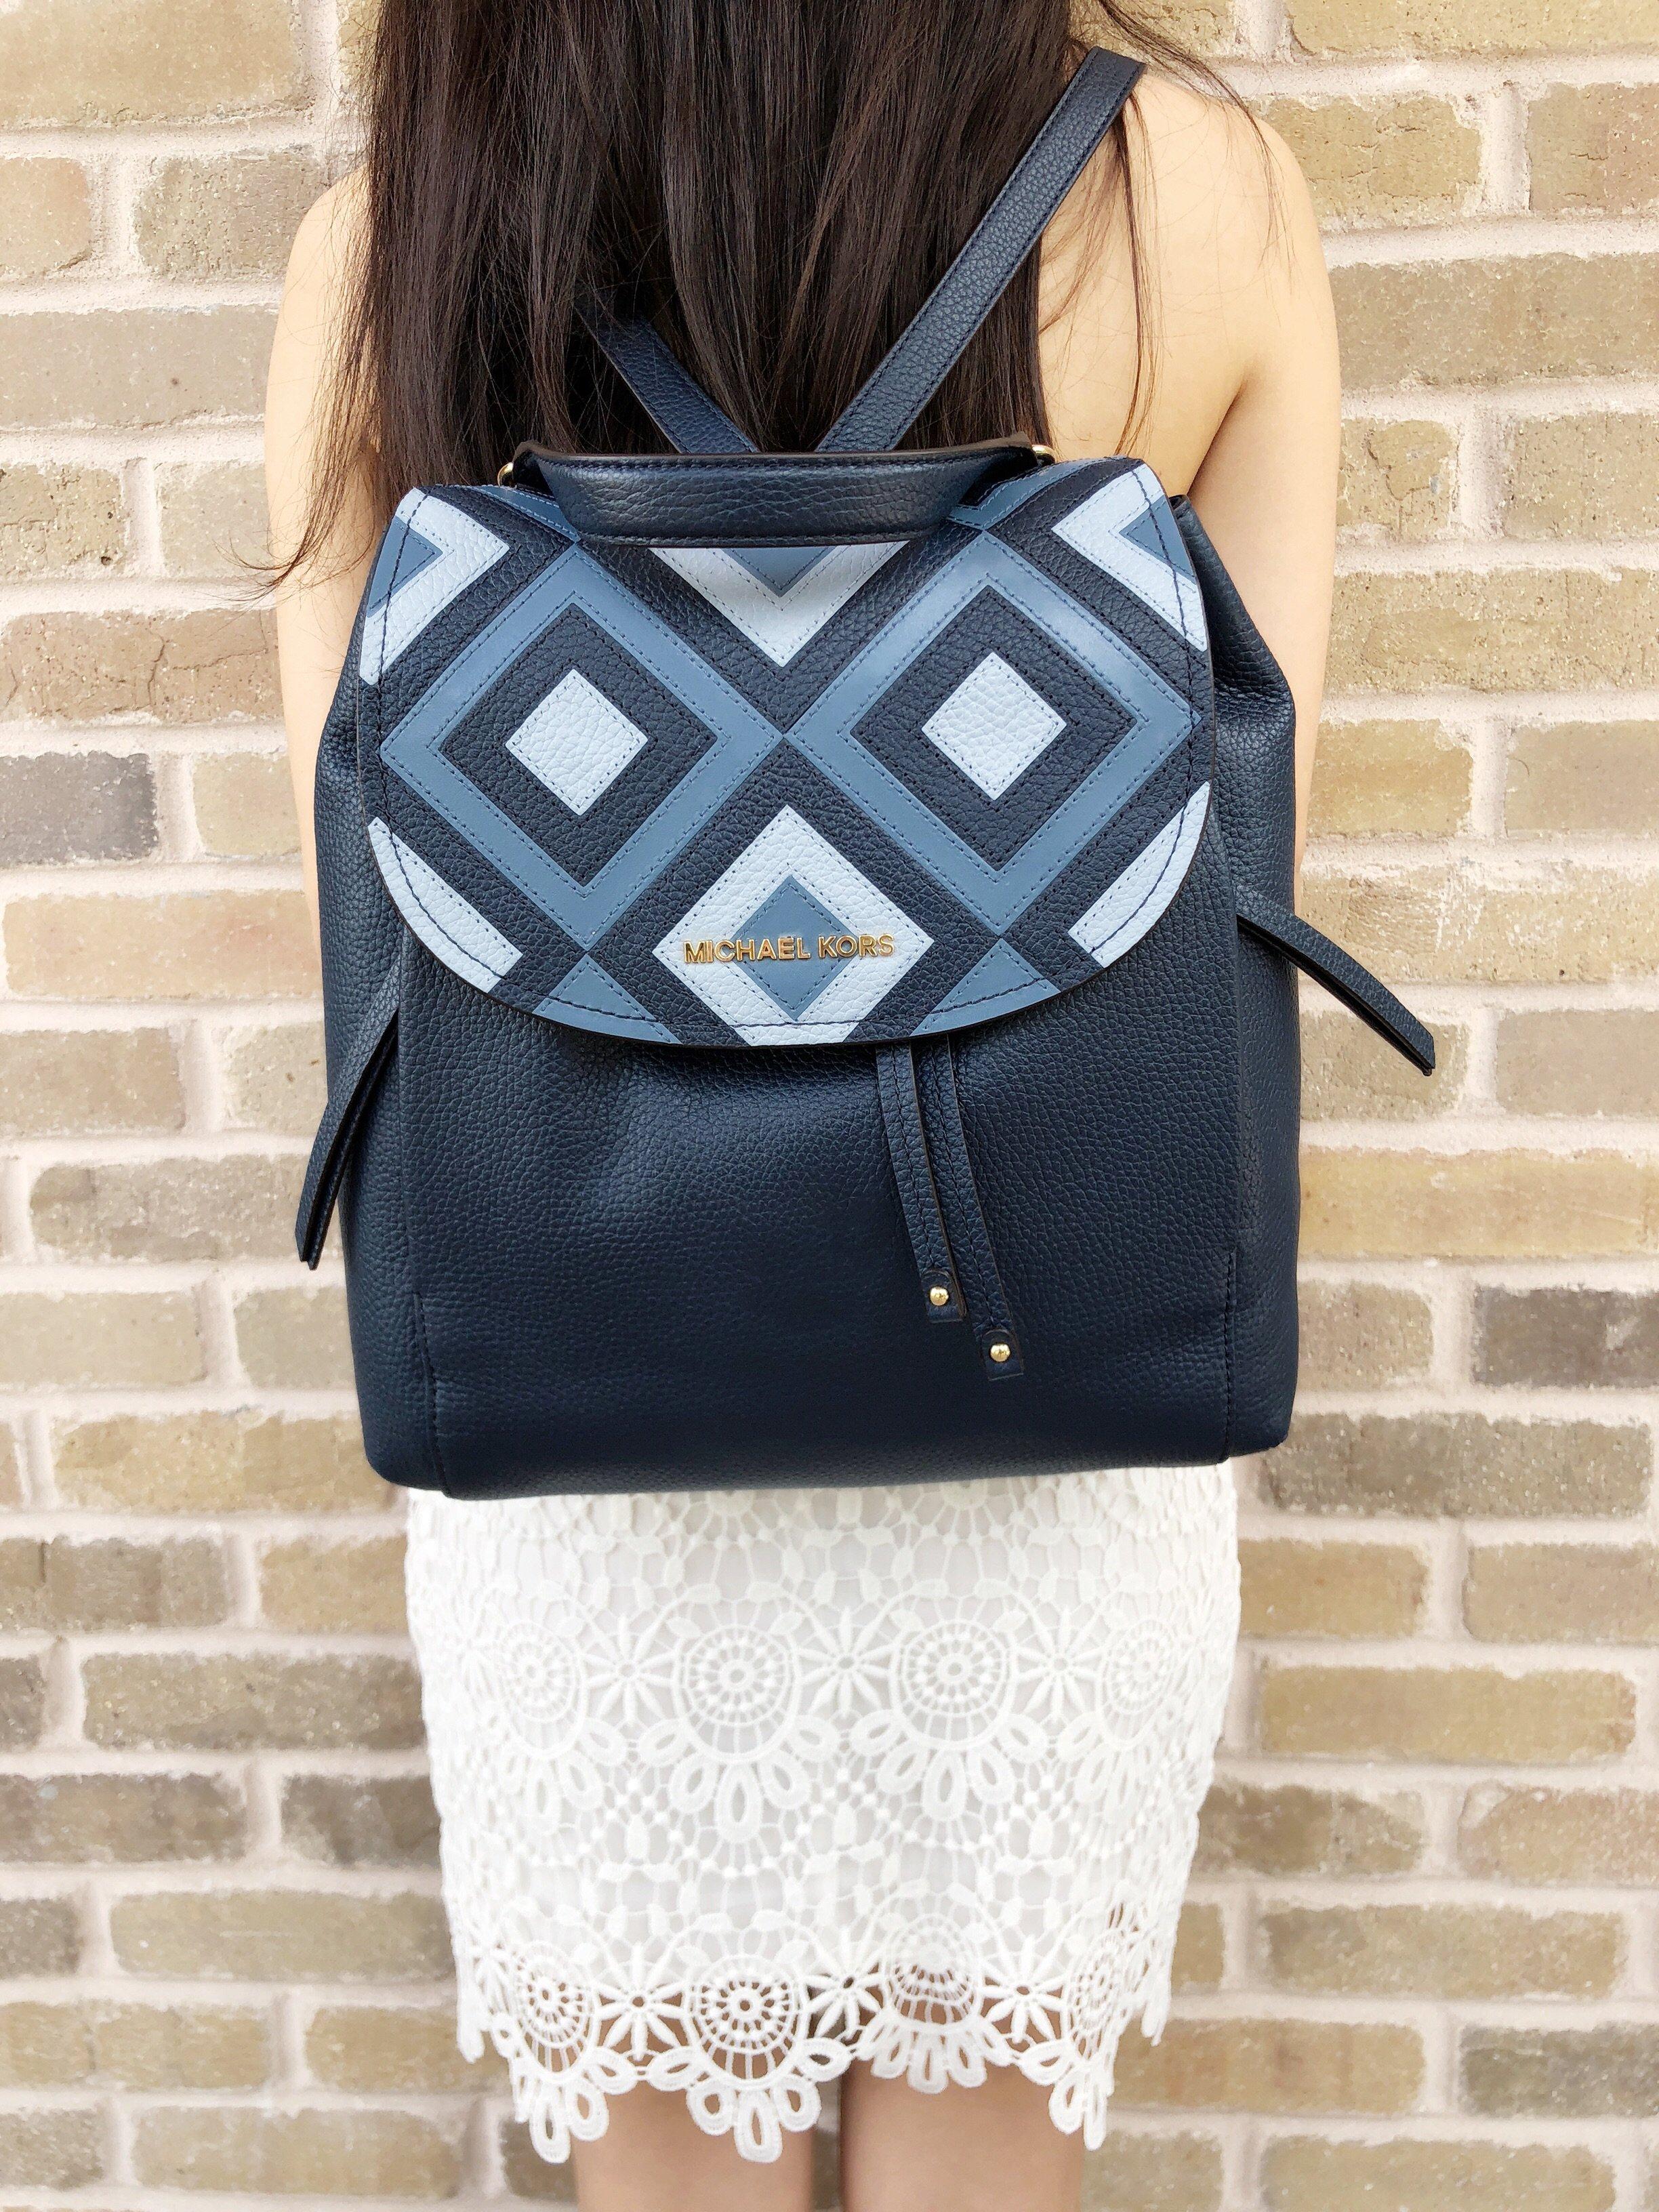 928654a45501 Michael Kors Riley Large Leather Backpack Pale Blue Navy Drawstring Flap Bag